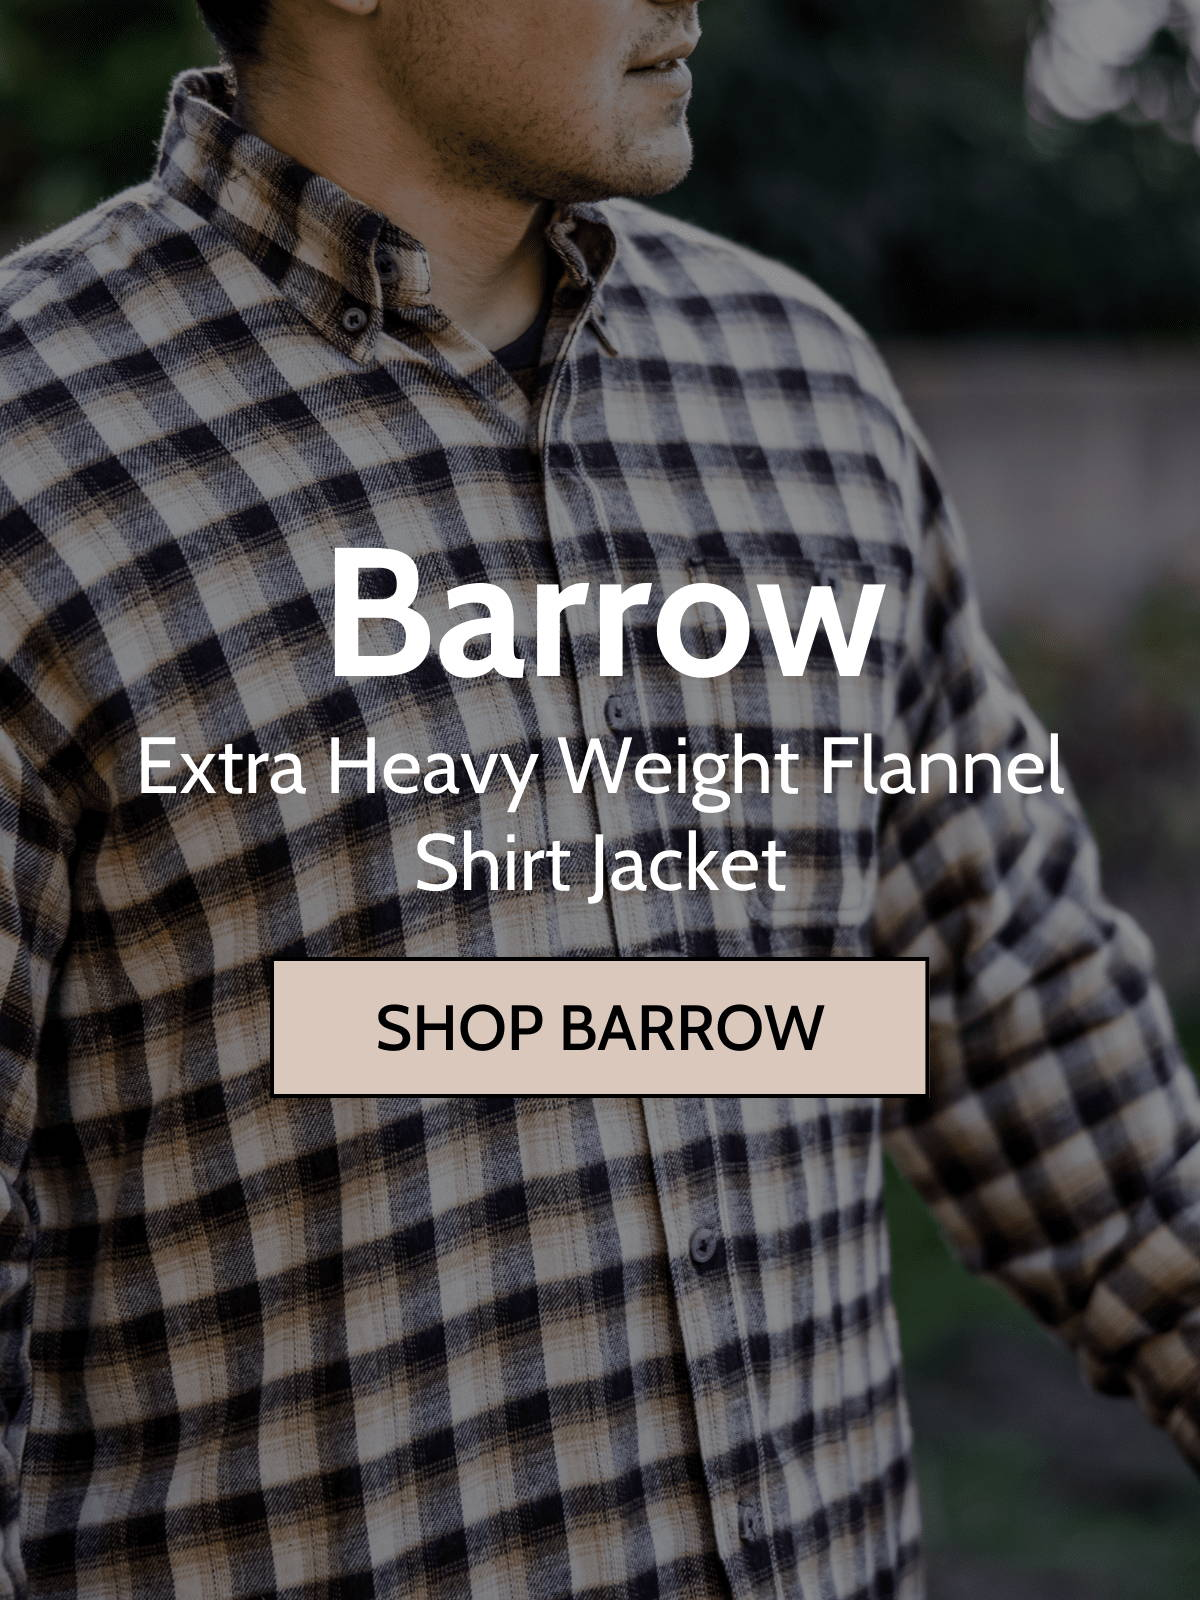 Man wearing barrow shirt jacket